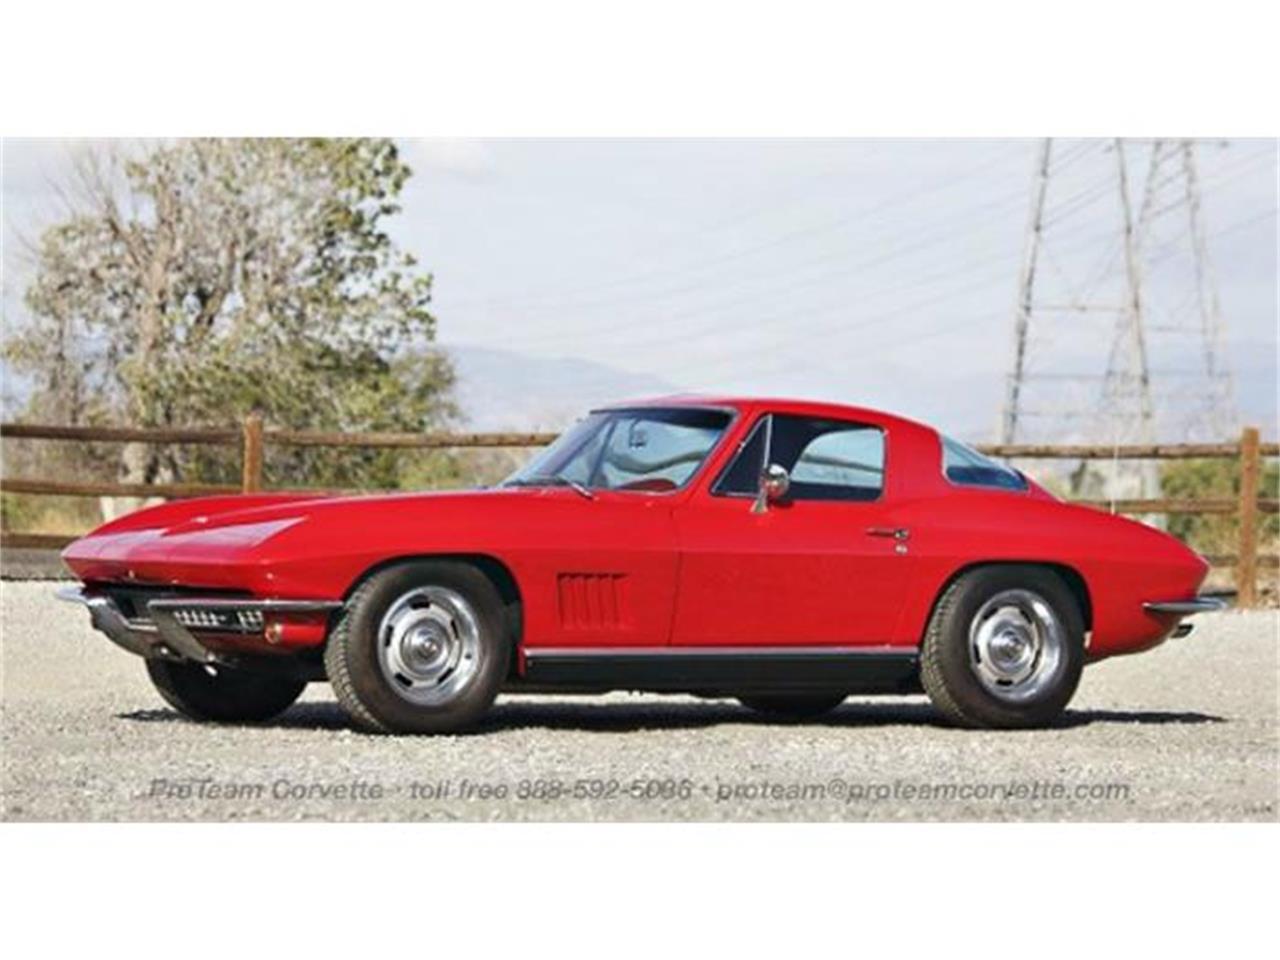 Large Picture of Classic '67 Corvette located in Napoleon Ohio Offered by Proteam Corvette Sales - I35A